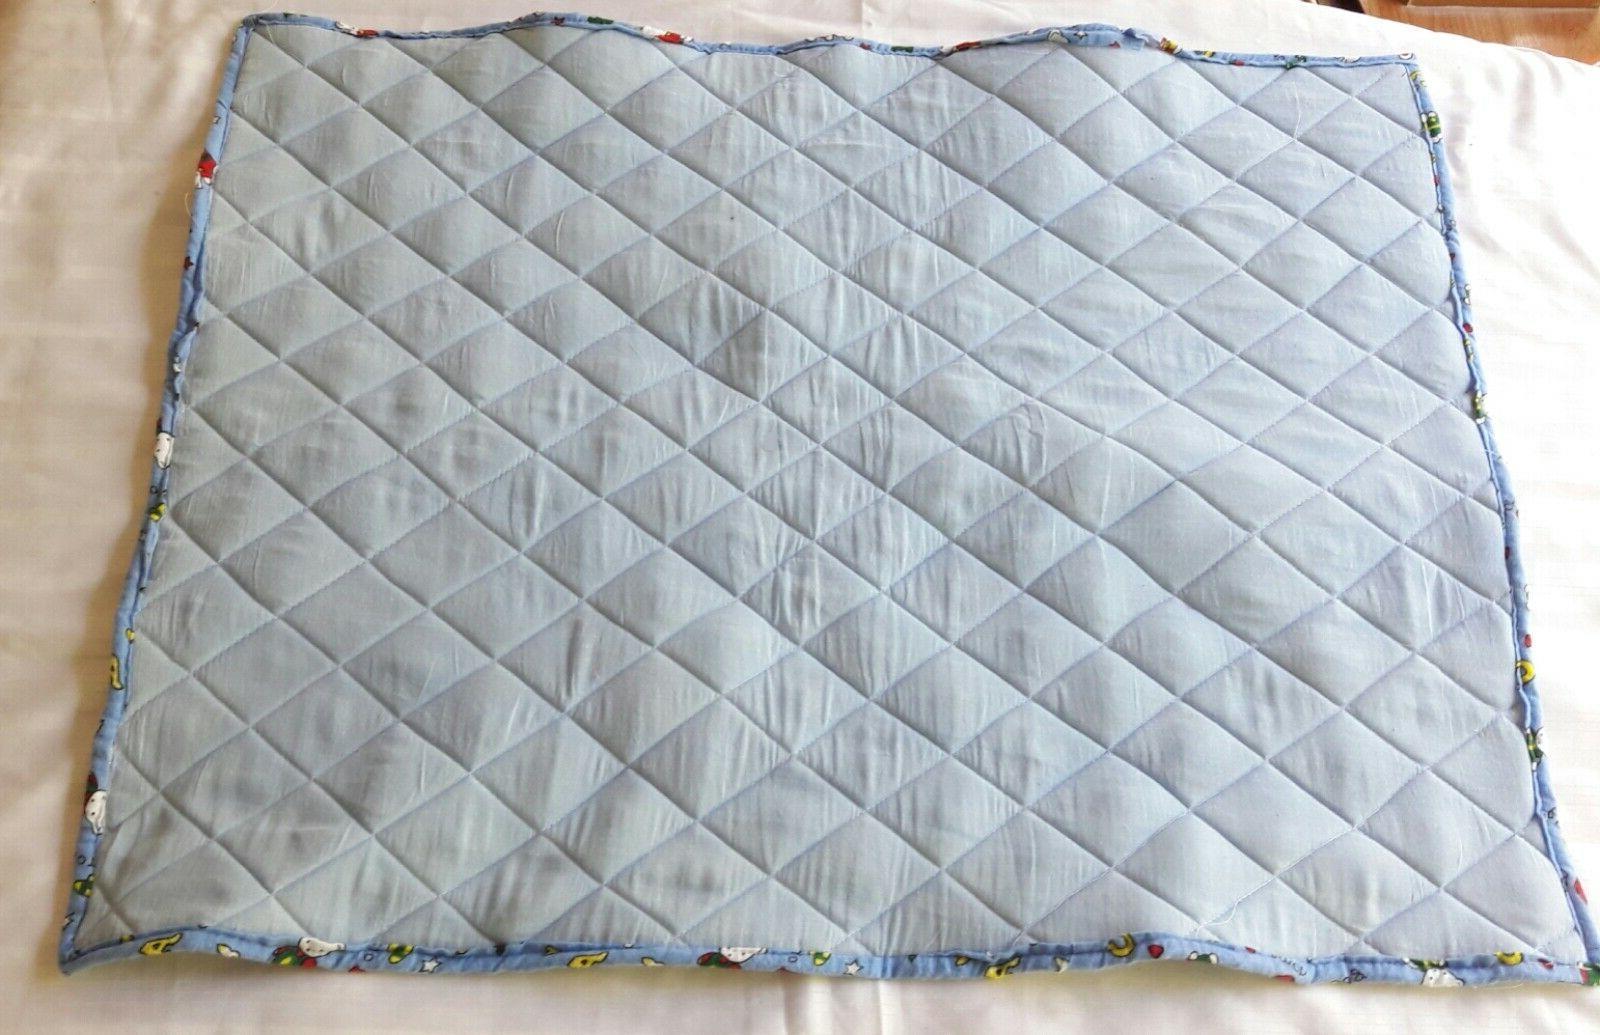 Sponge BABY COT SHEET Bedding Design